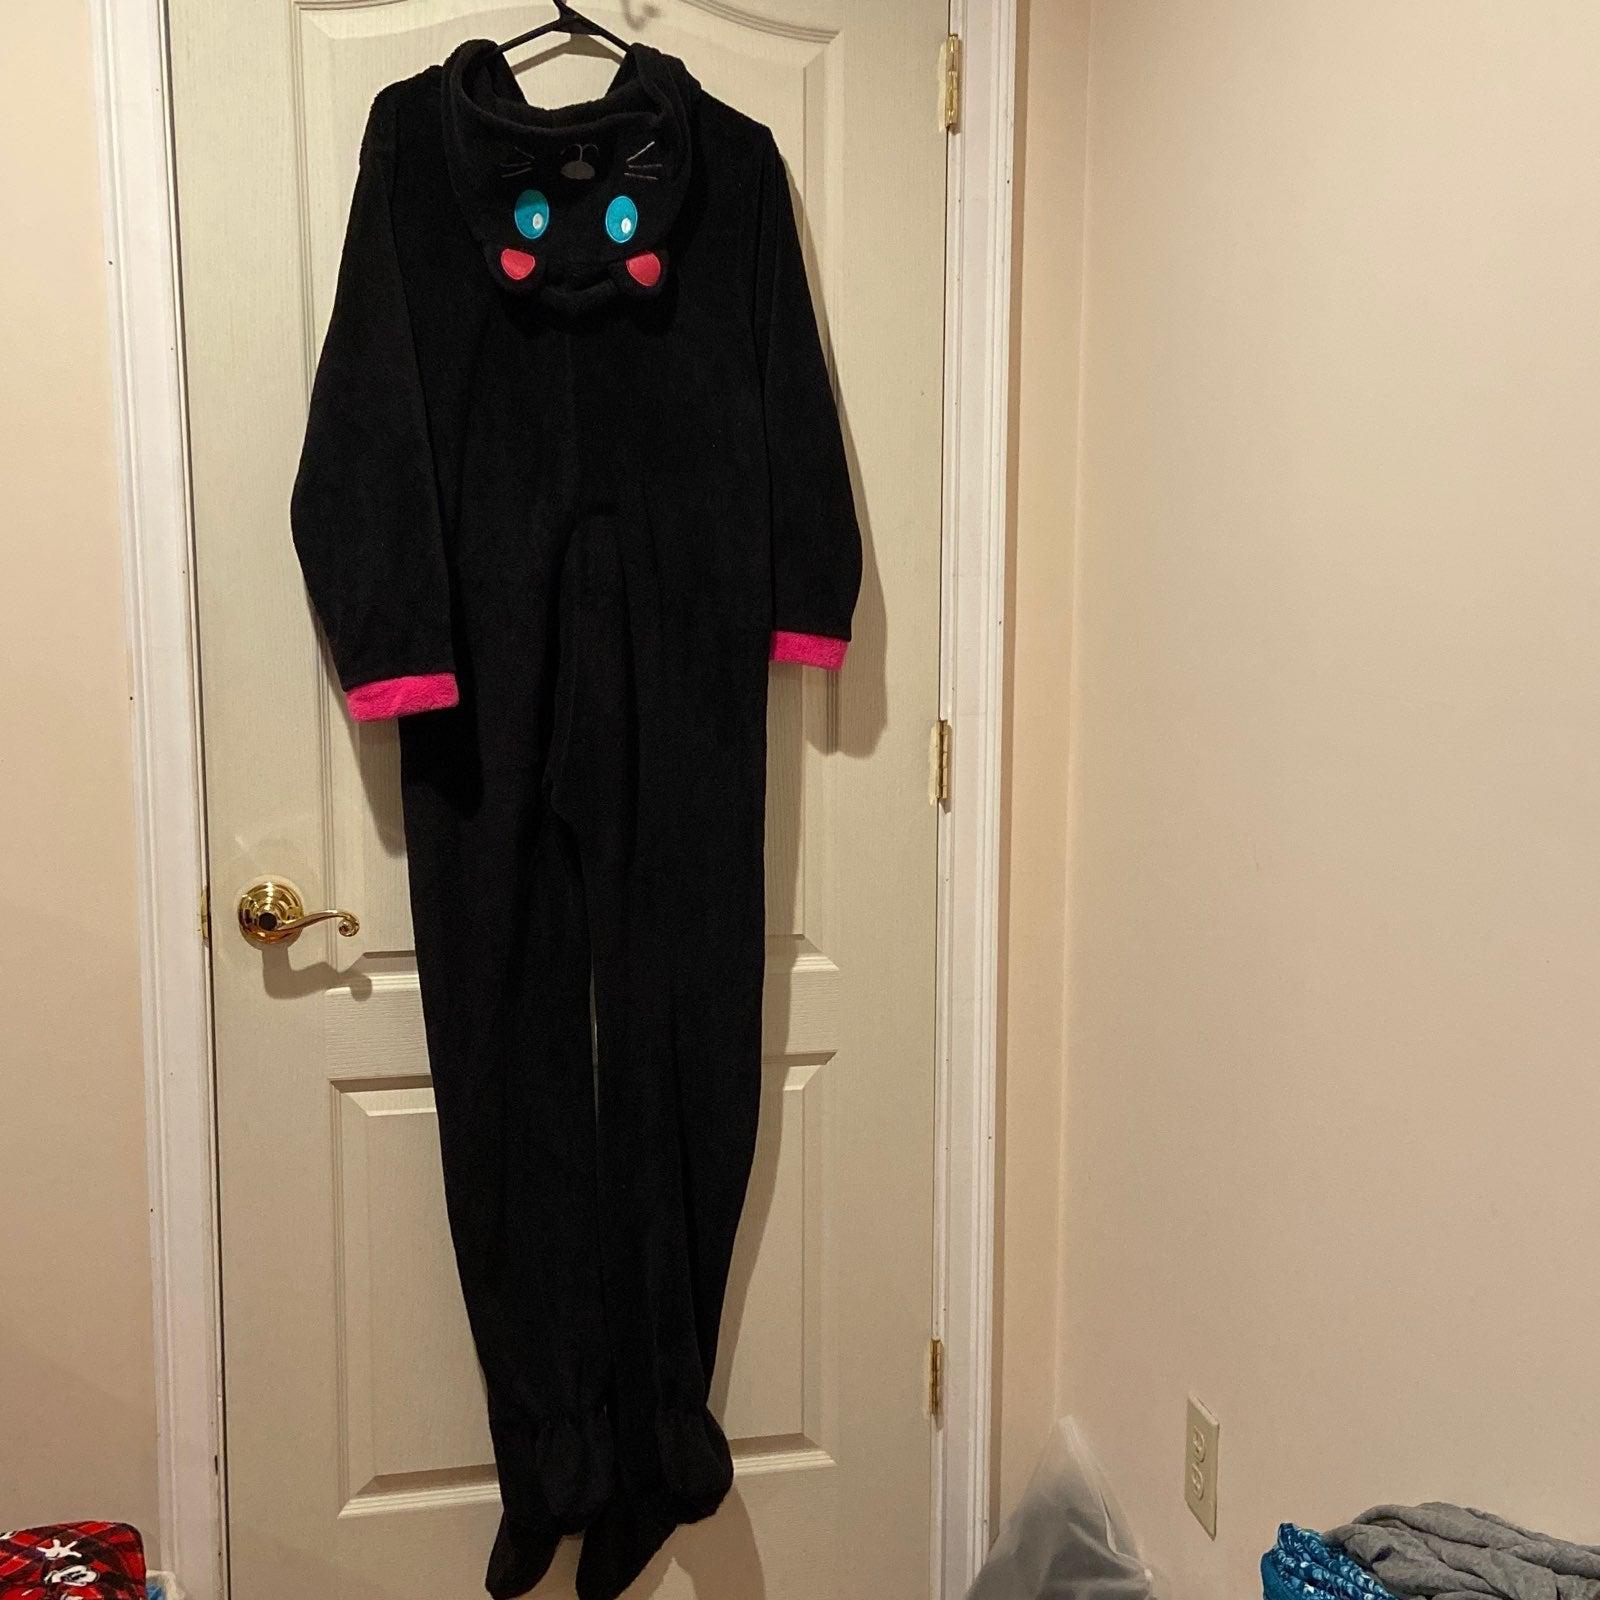 PJ Couture - Hooded Cat Onesie Pajamas